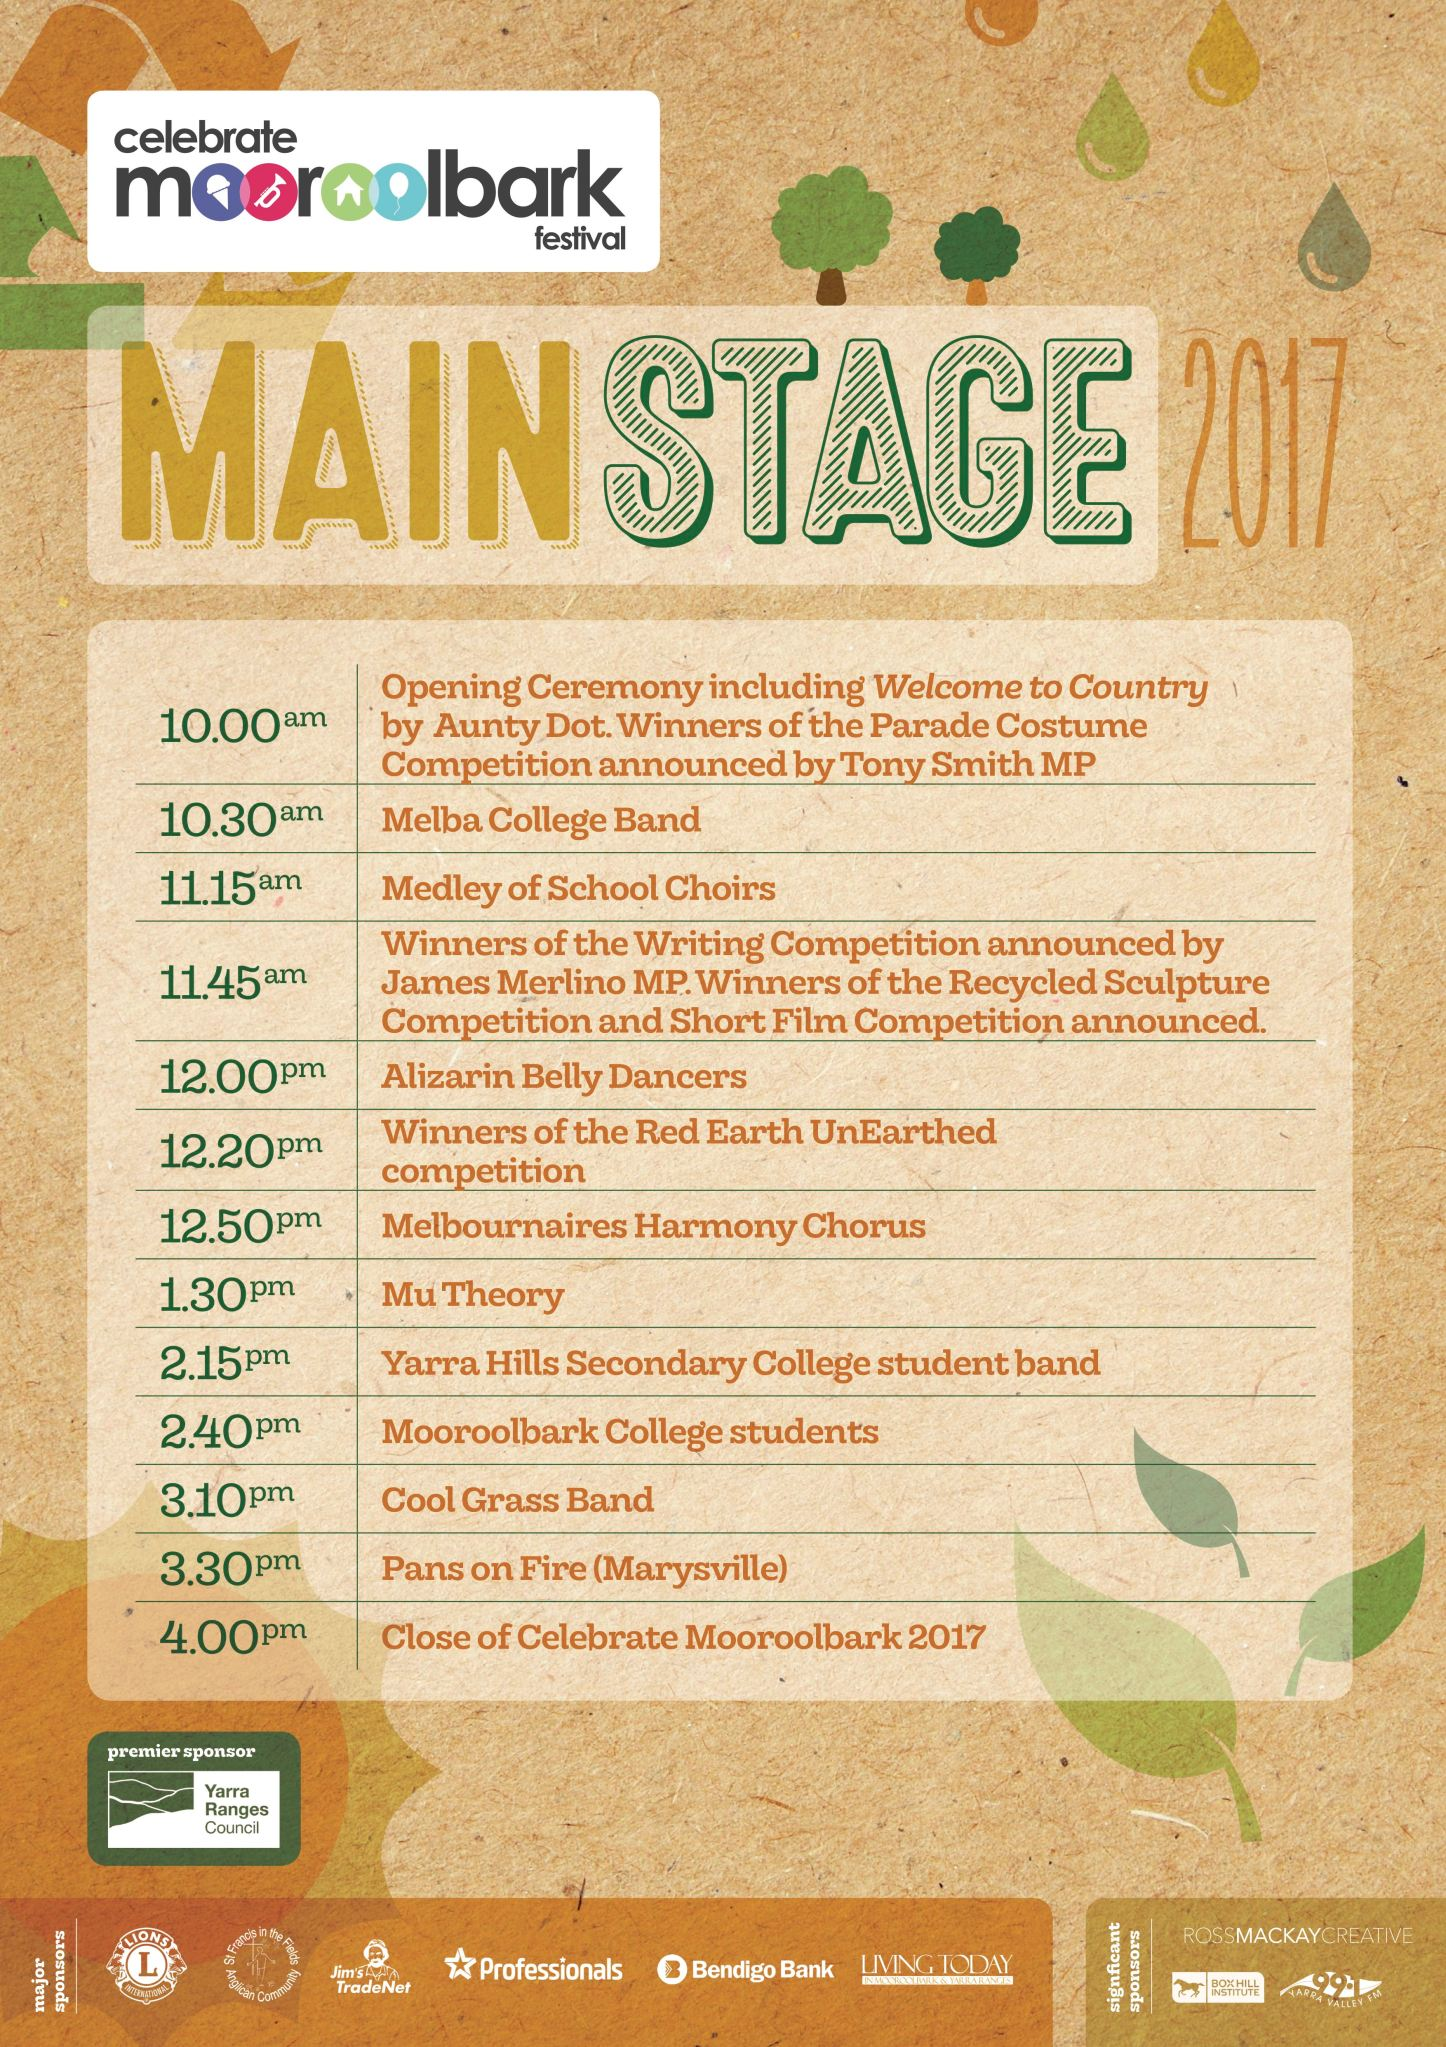 CM2017_MainStage_web